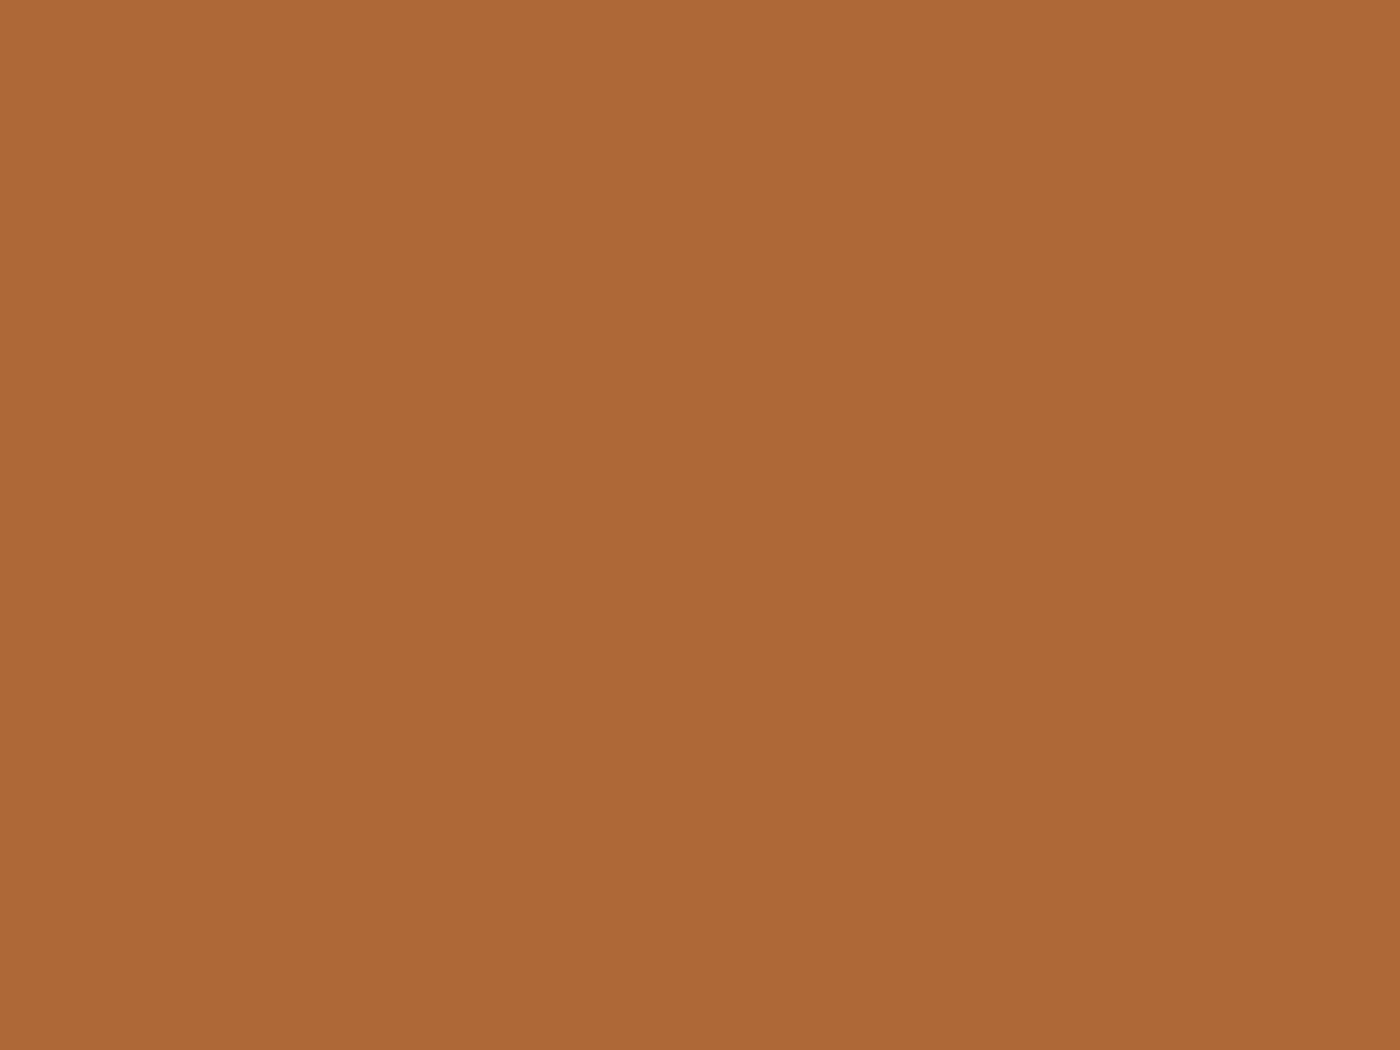 1400x1050 Windsor Tan Solid Color Background